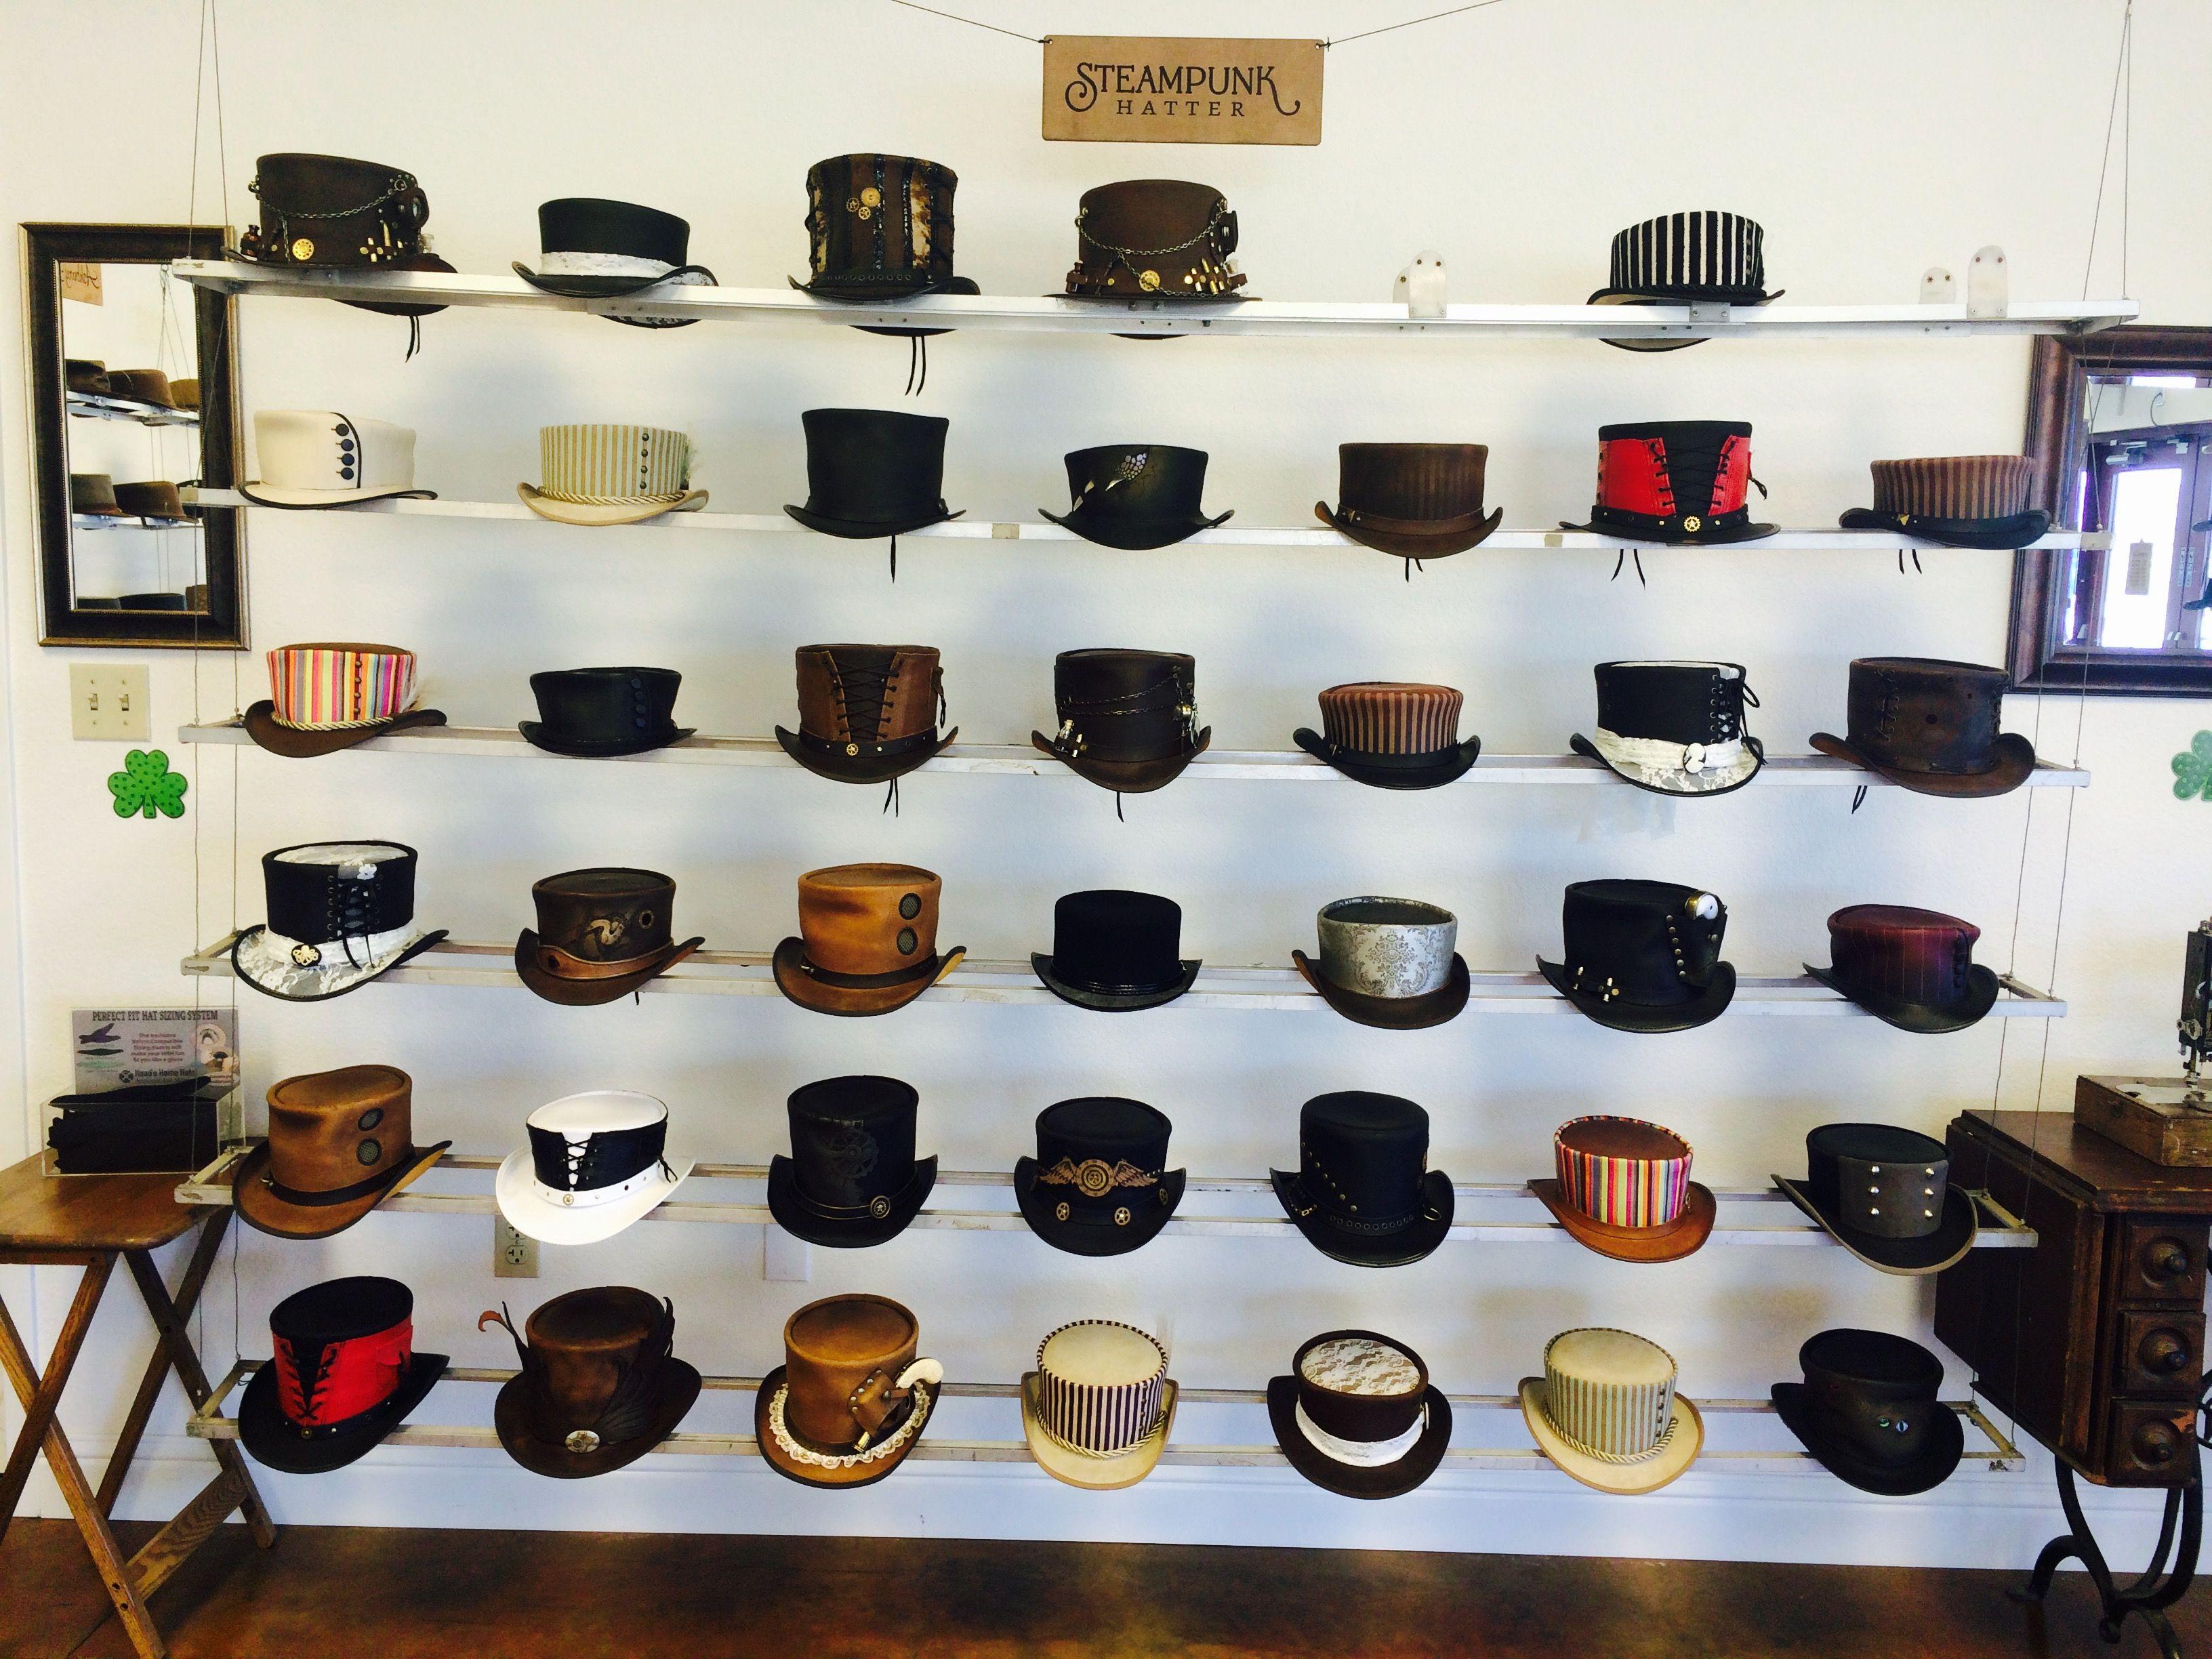 Steampunk Hatter at The Hat Hangar! #AmericanHatMakers #1800NiceHat #smallbusiness #marketing #success #leatherhats #wholesale #hatmanufacturers #branding